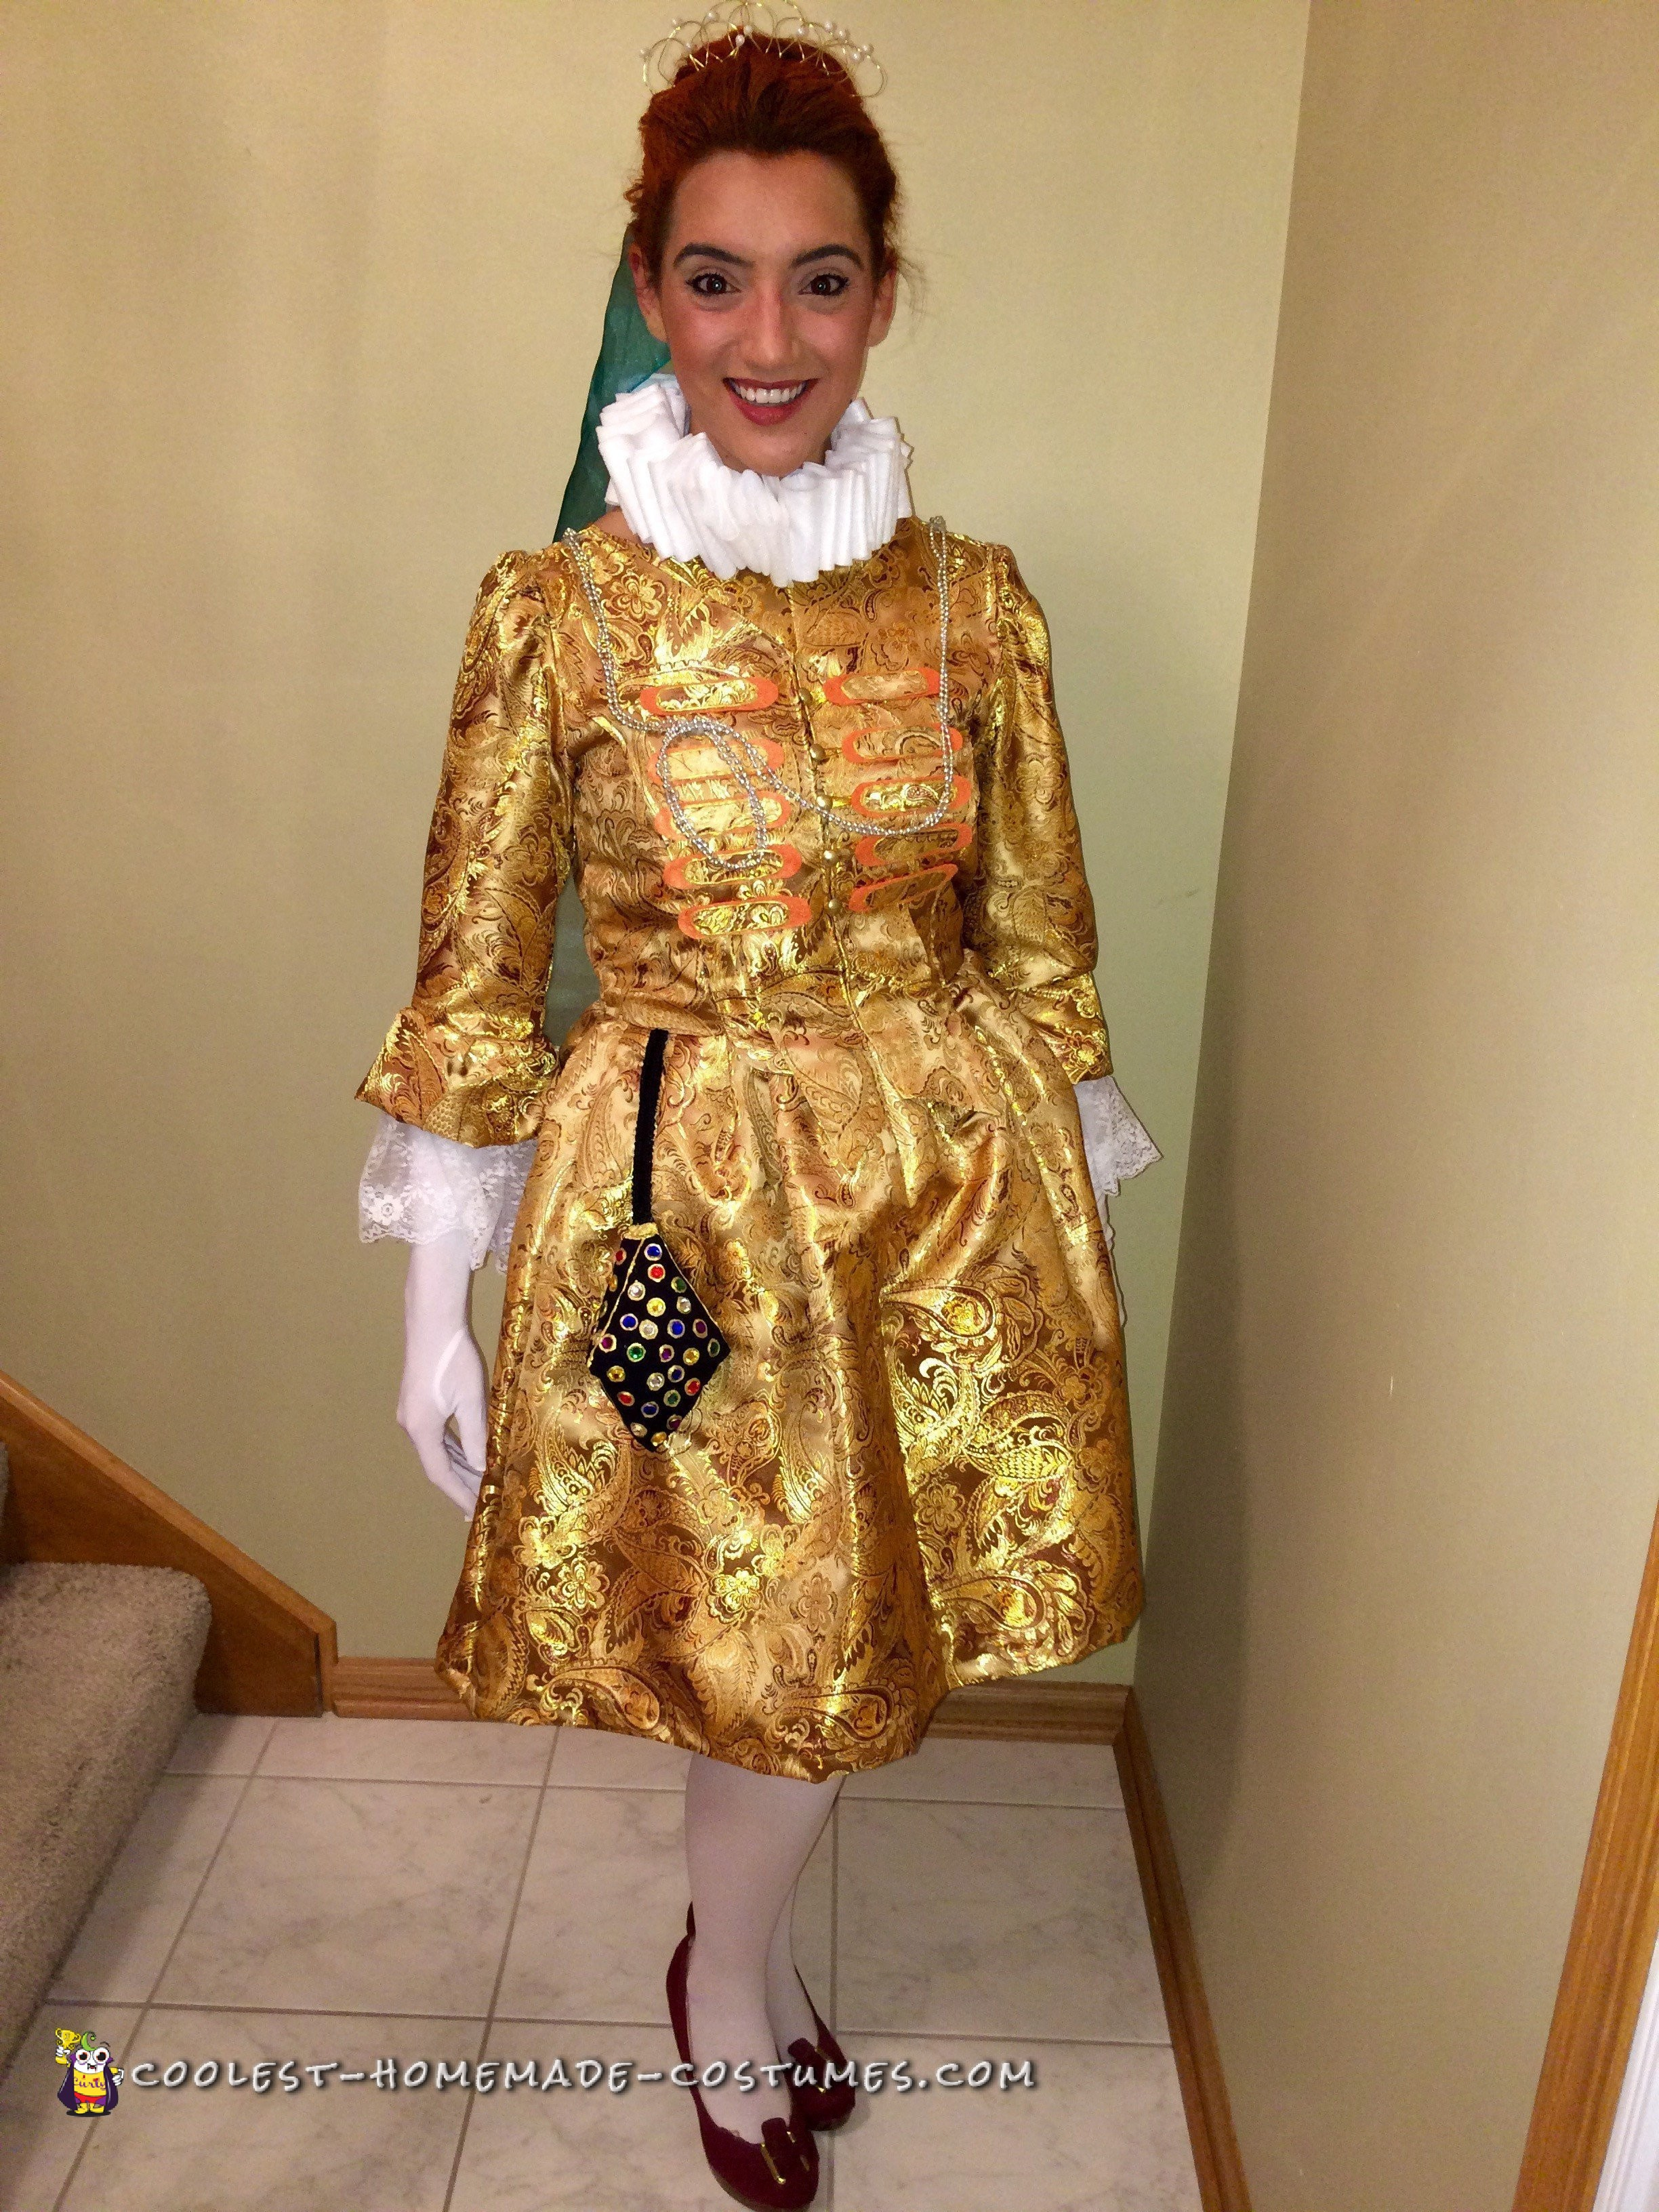 Queen Elizabeth I of England Costume